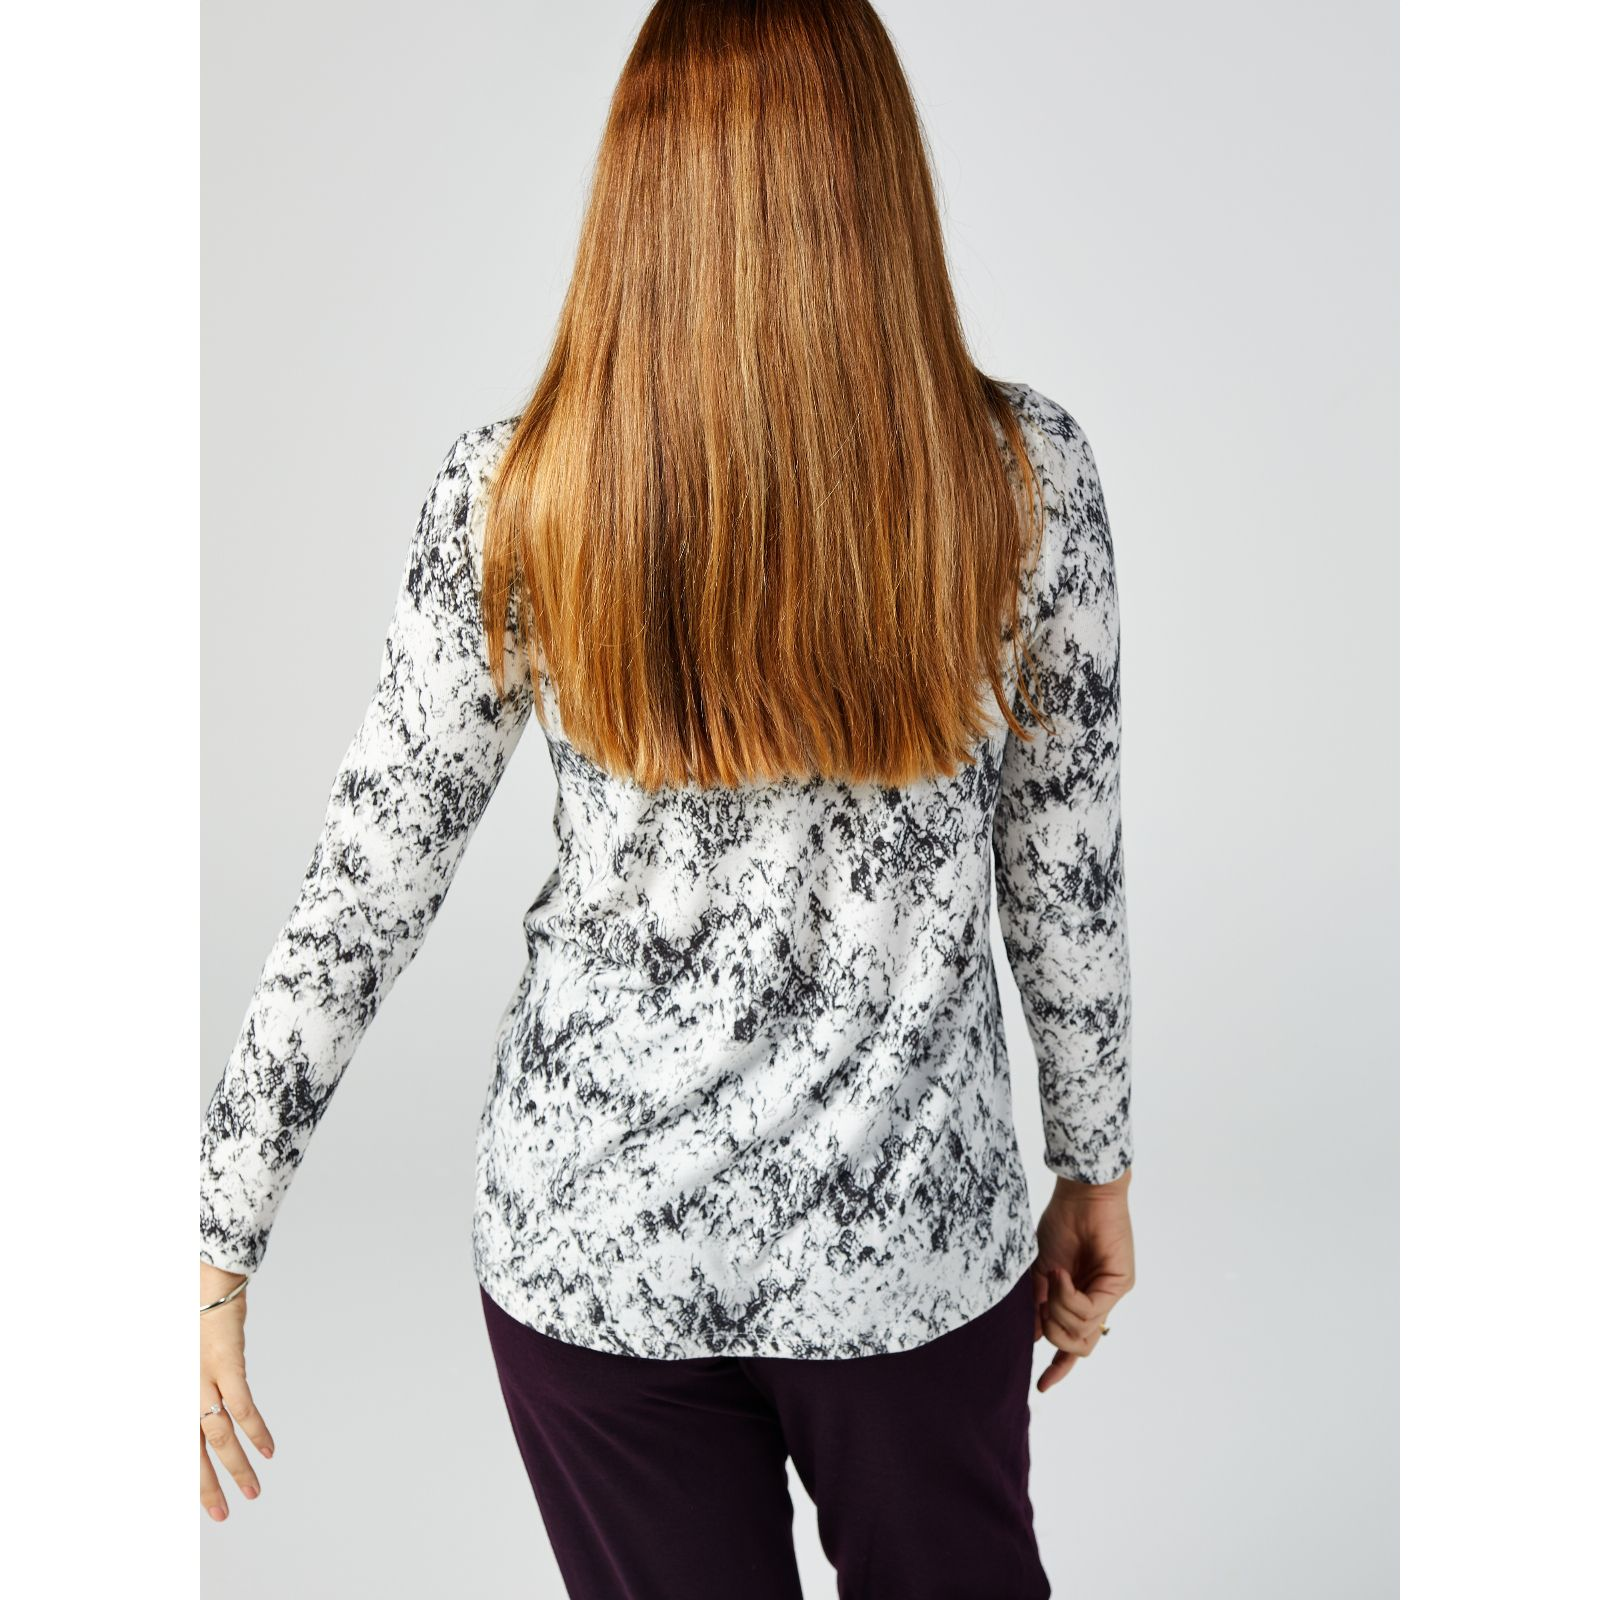 57a83c64bca8 Kim   Co Soft Touch Sweet V Neck Long Sleeve Tunic w  Infinity Scarf - QVC  UK